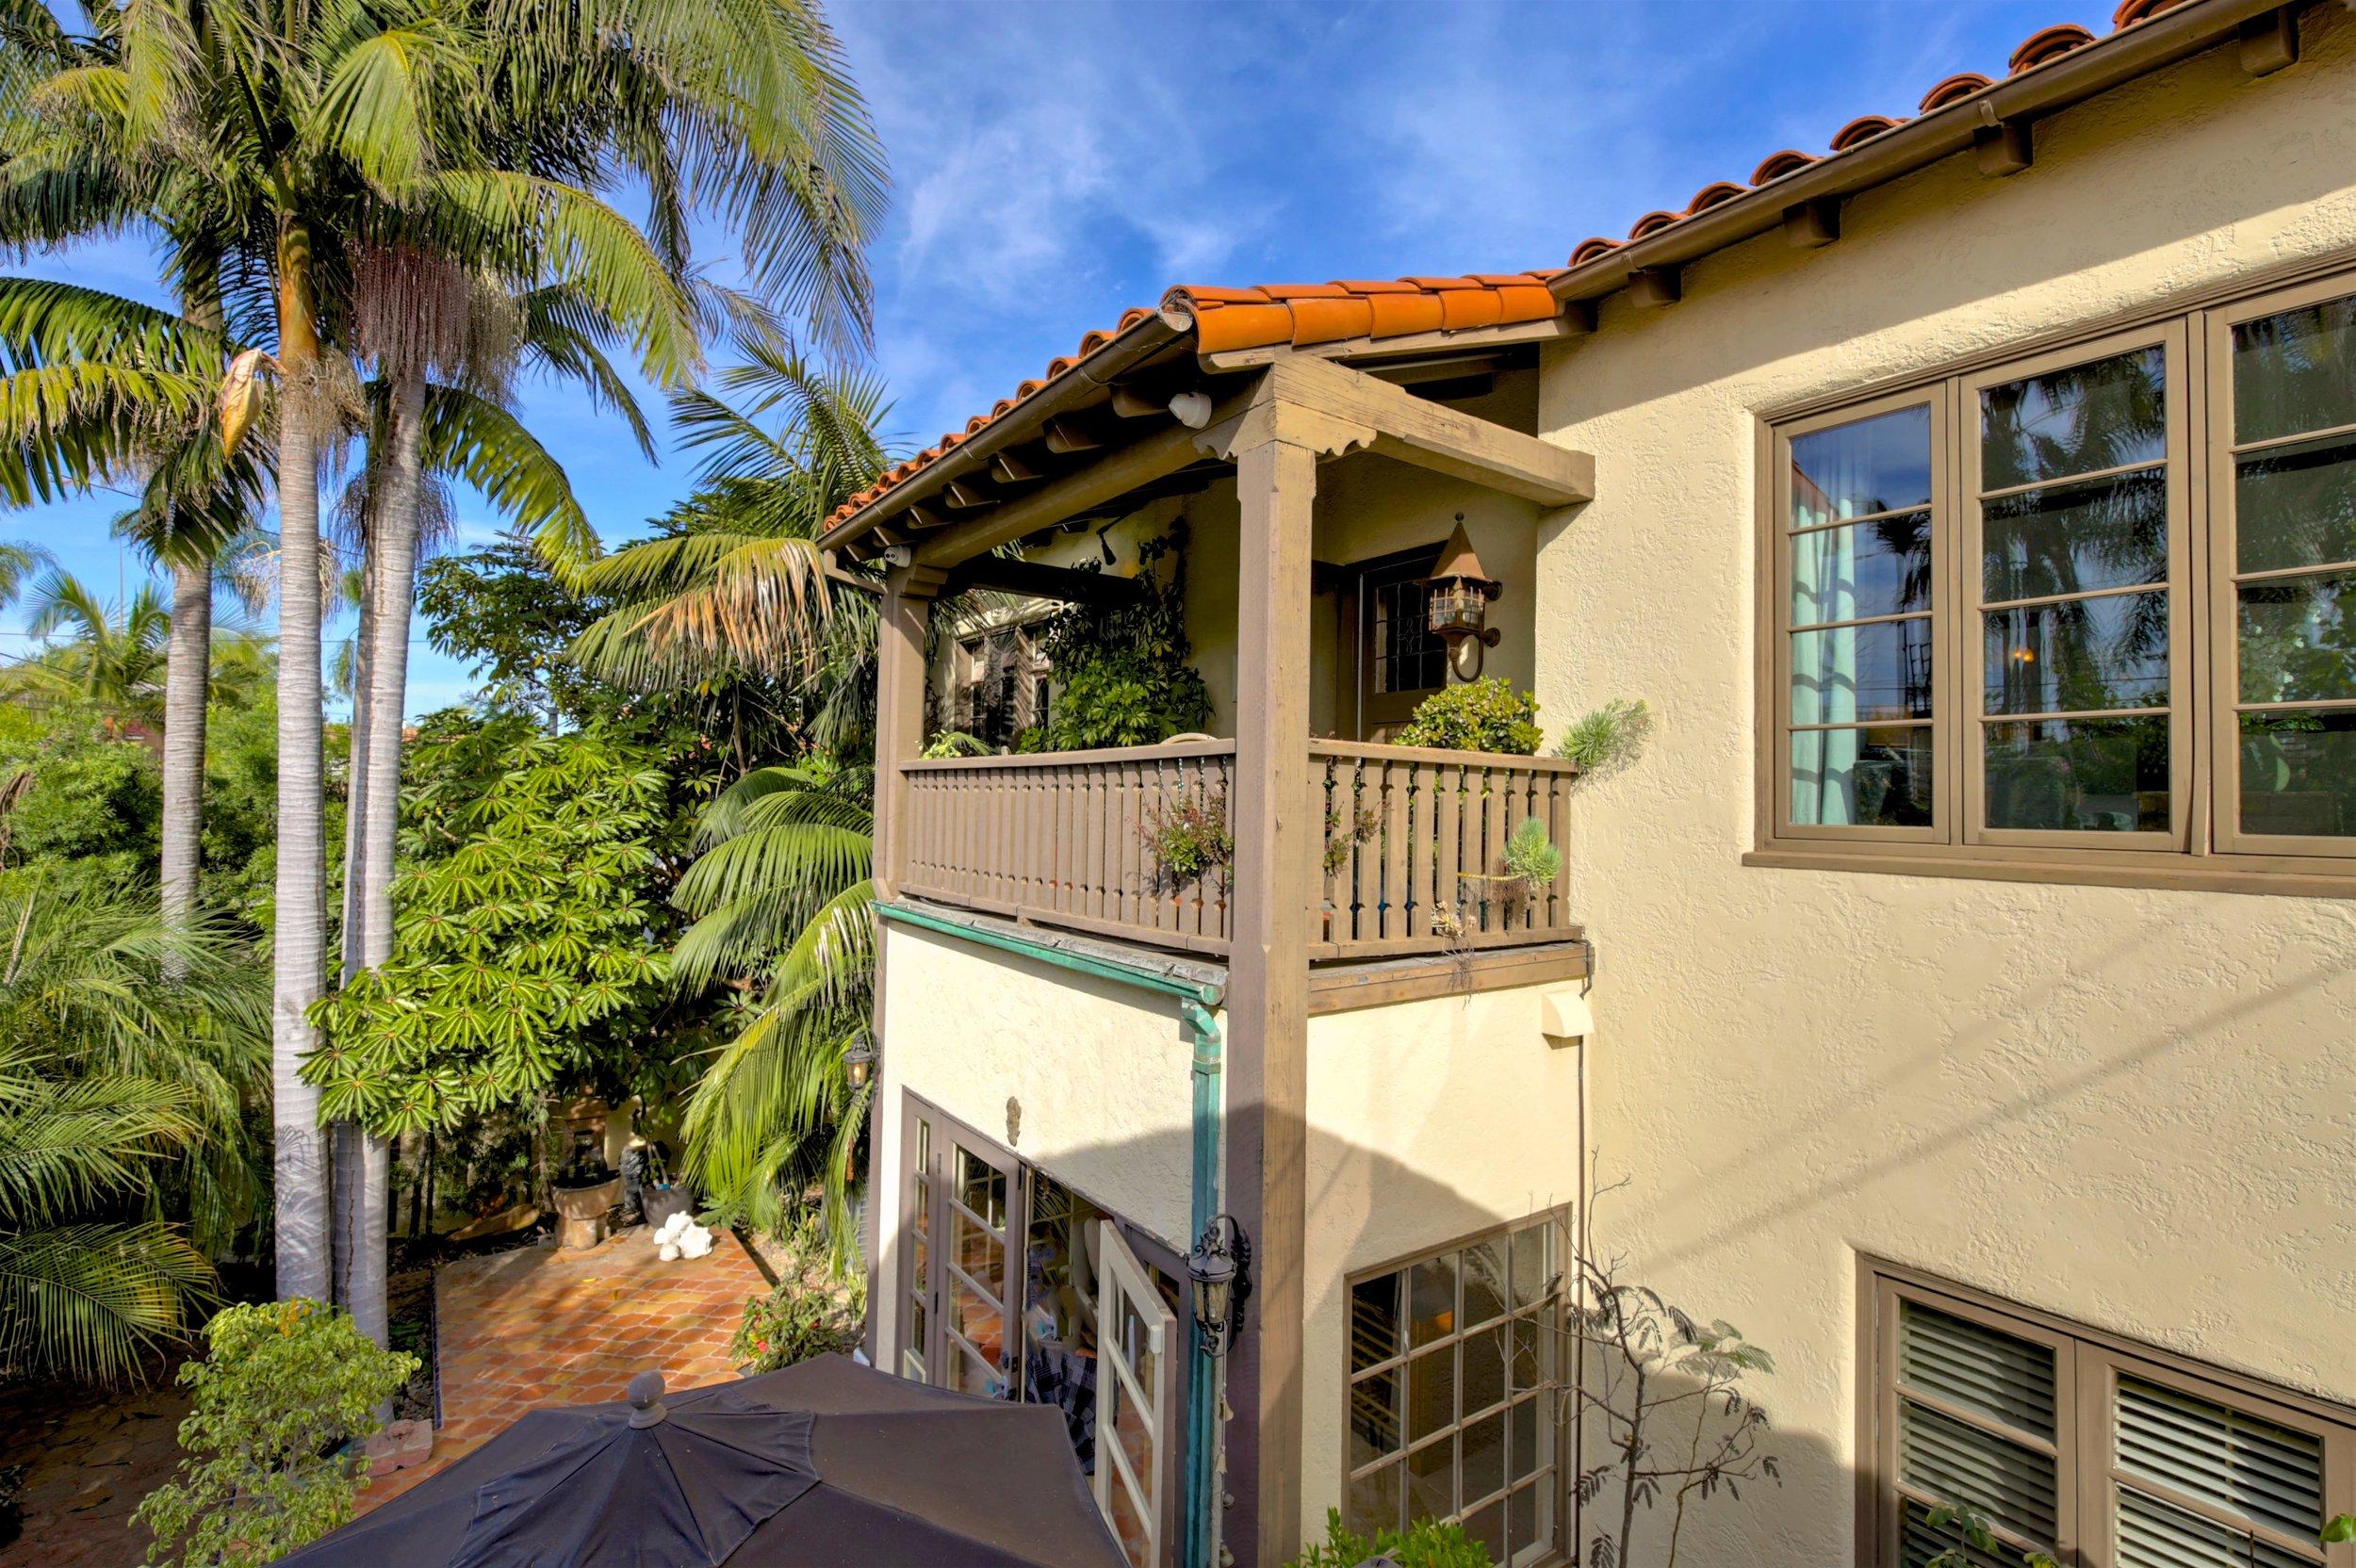 243 Euclid Ave Long Beach CA-print-054-63-243Euclid 054-4200x2796-300dpi.jpg